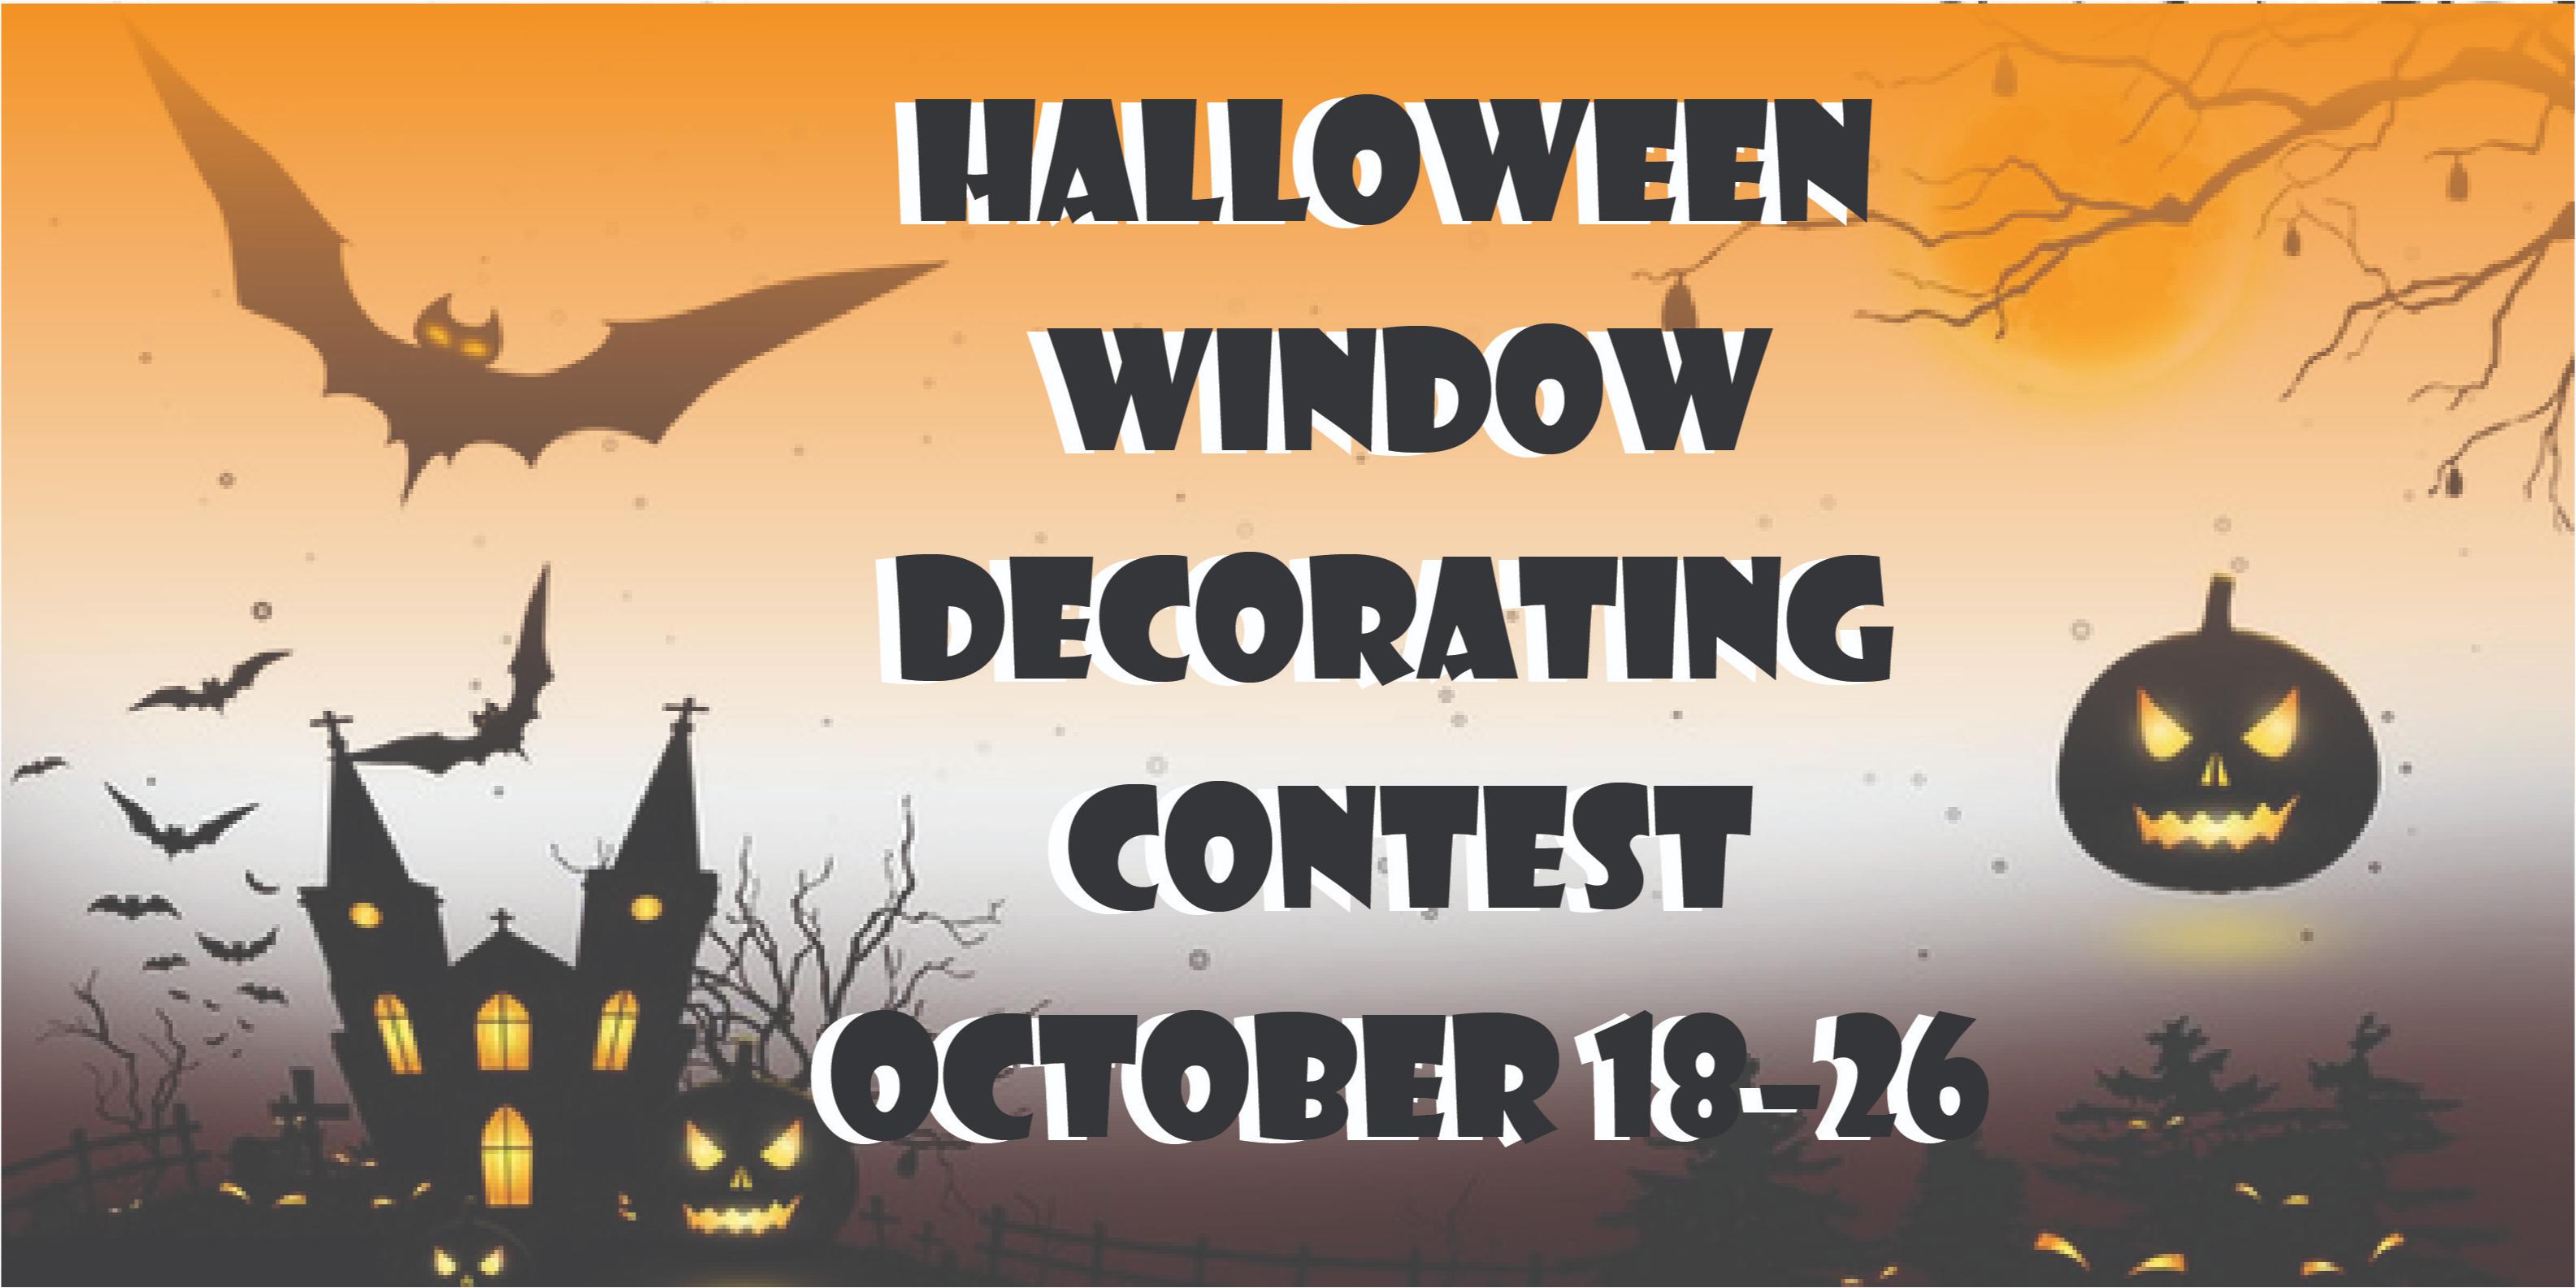 Halloween Window Decorating Contest